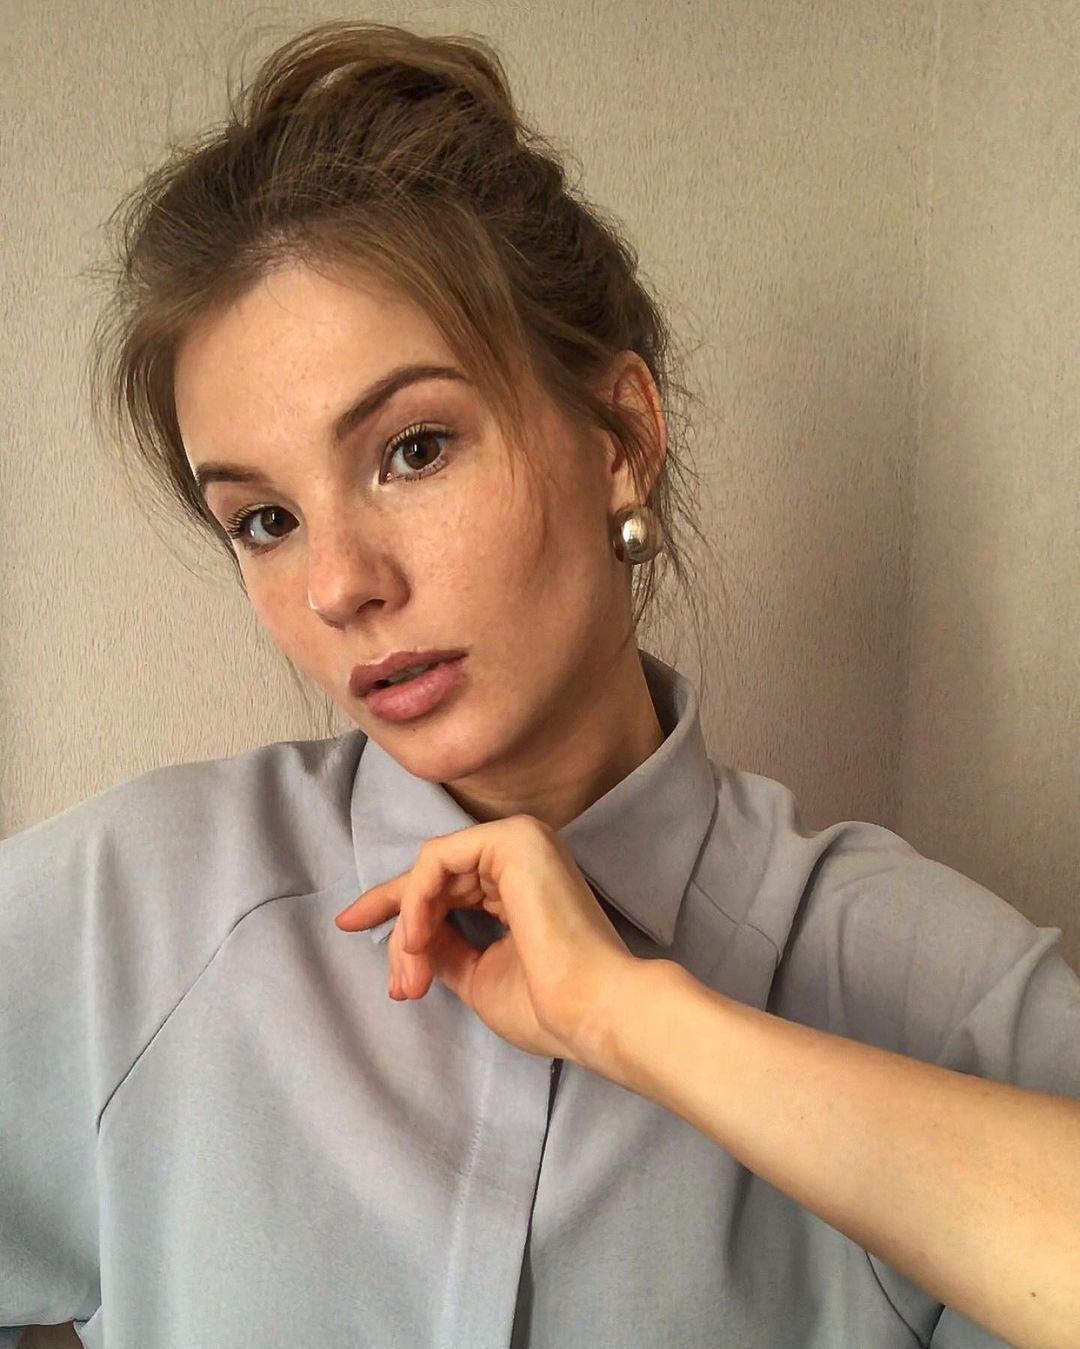 Anna-Kudinova-Wallpapers-Insta-Fit-Bio-9